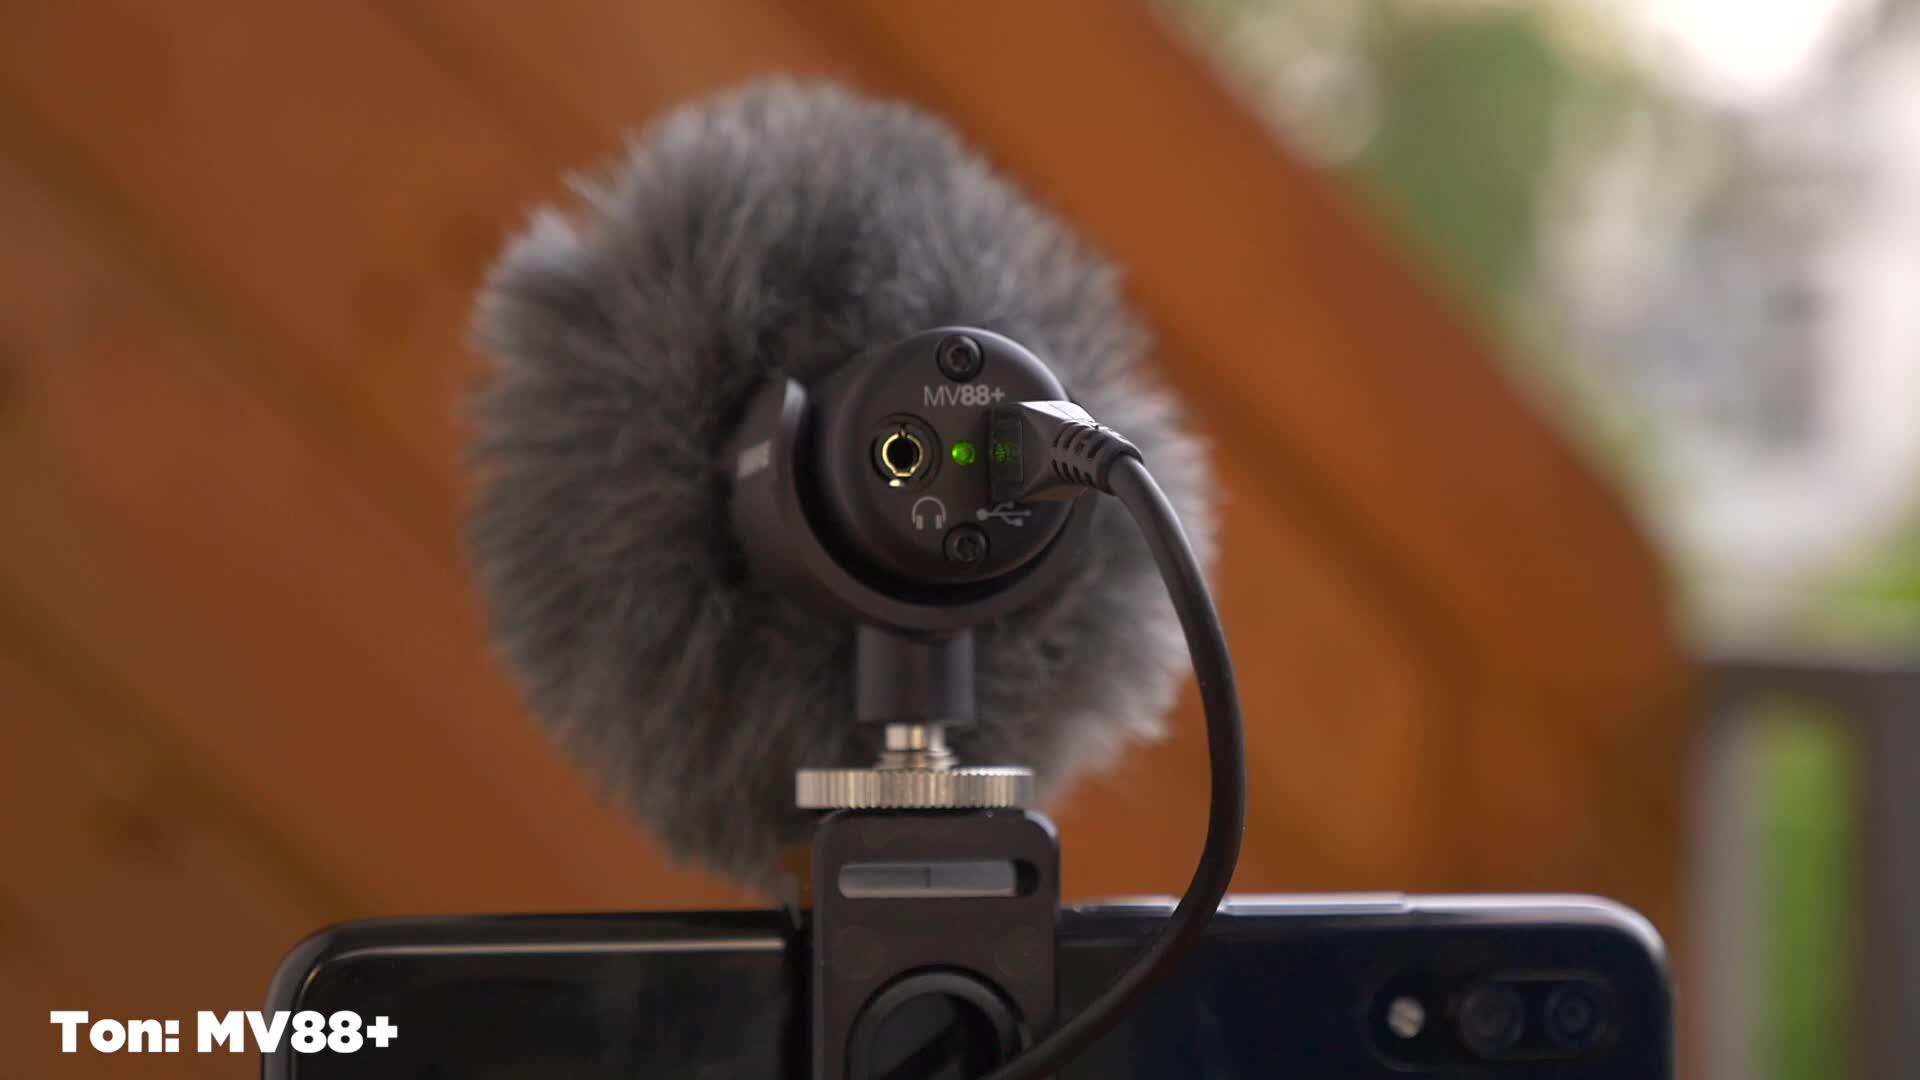 Smartphone, Video, Timm Mohn, Mikrofon, Shure, MV88+